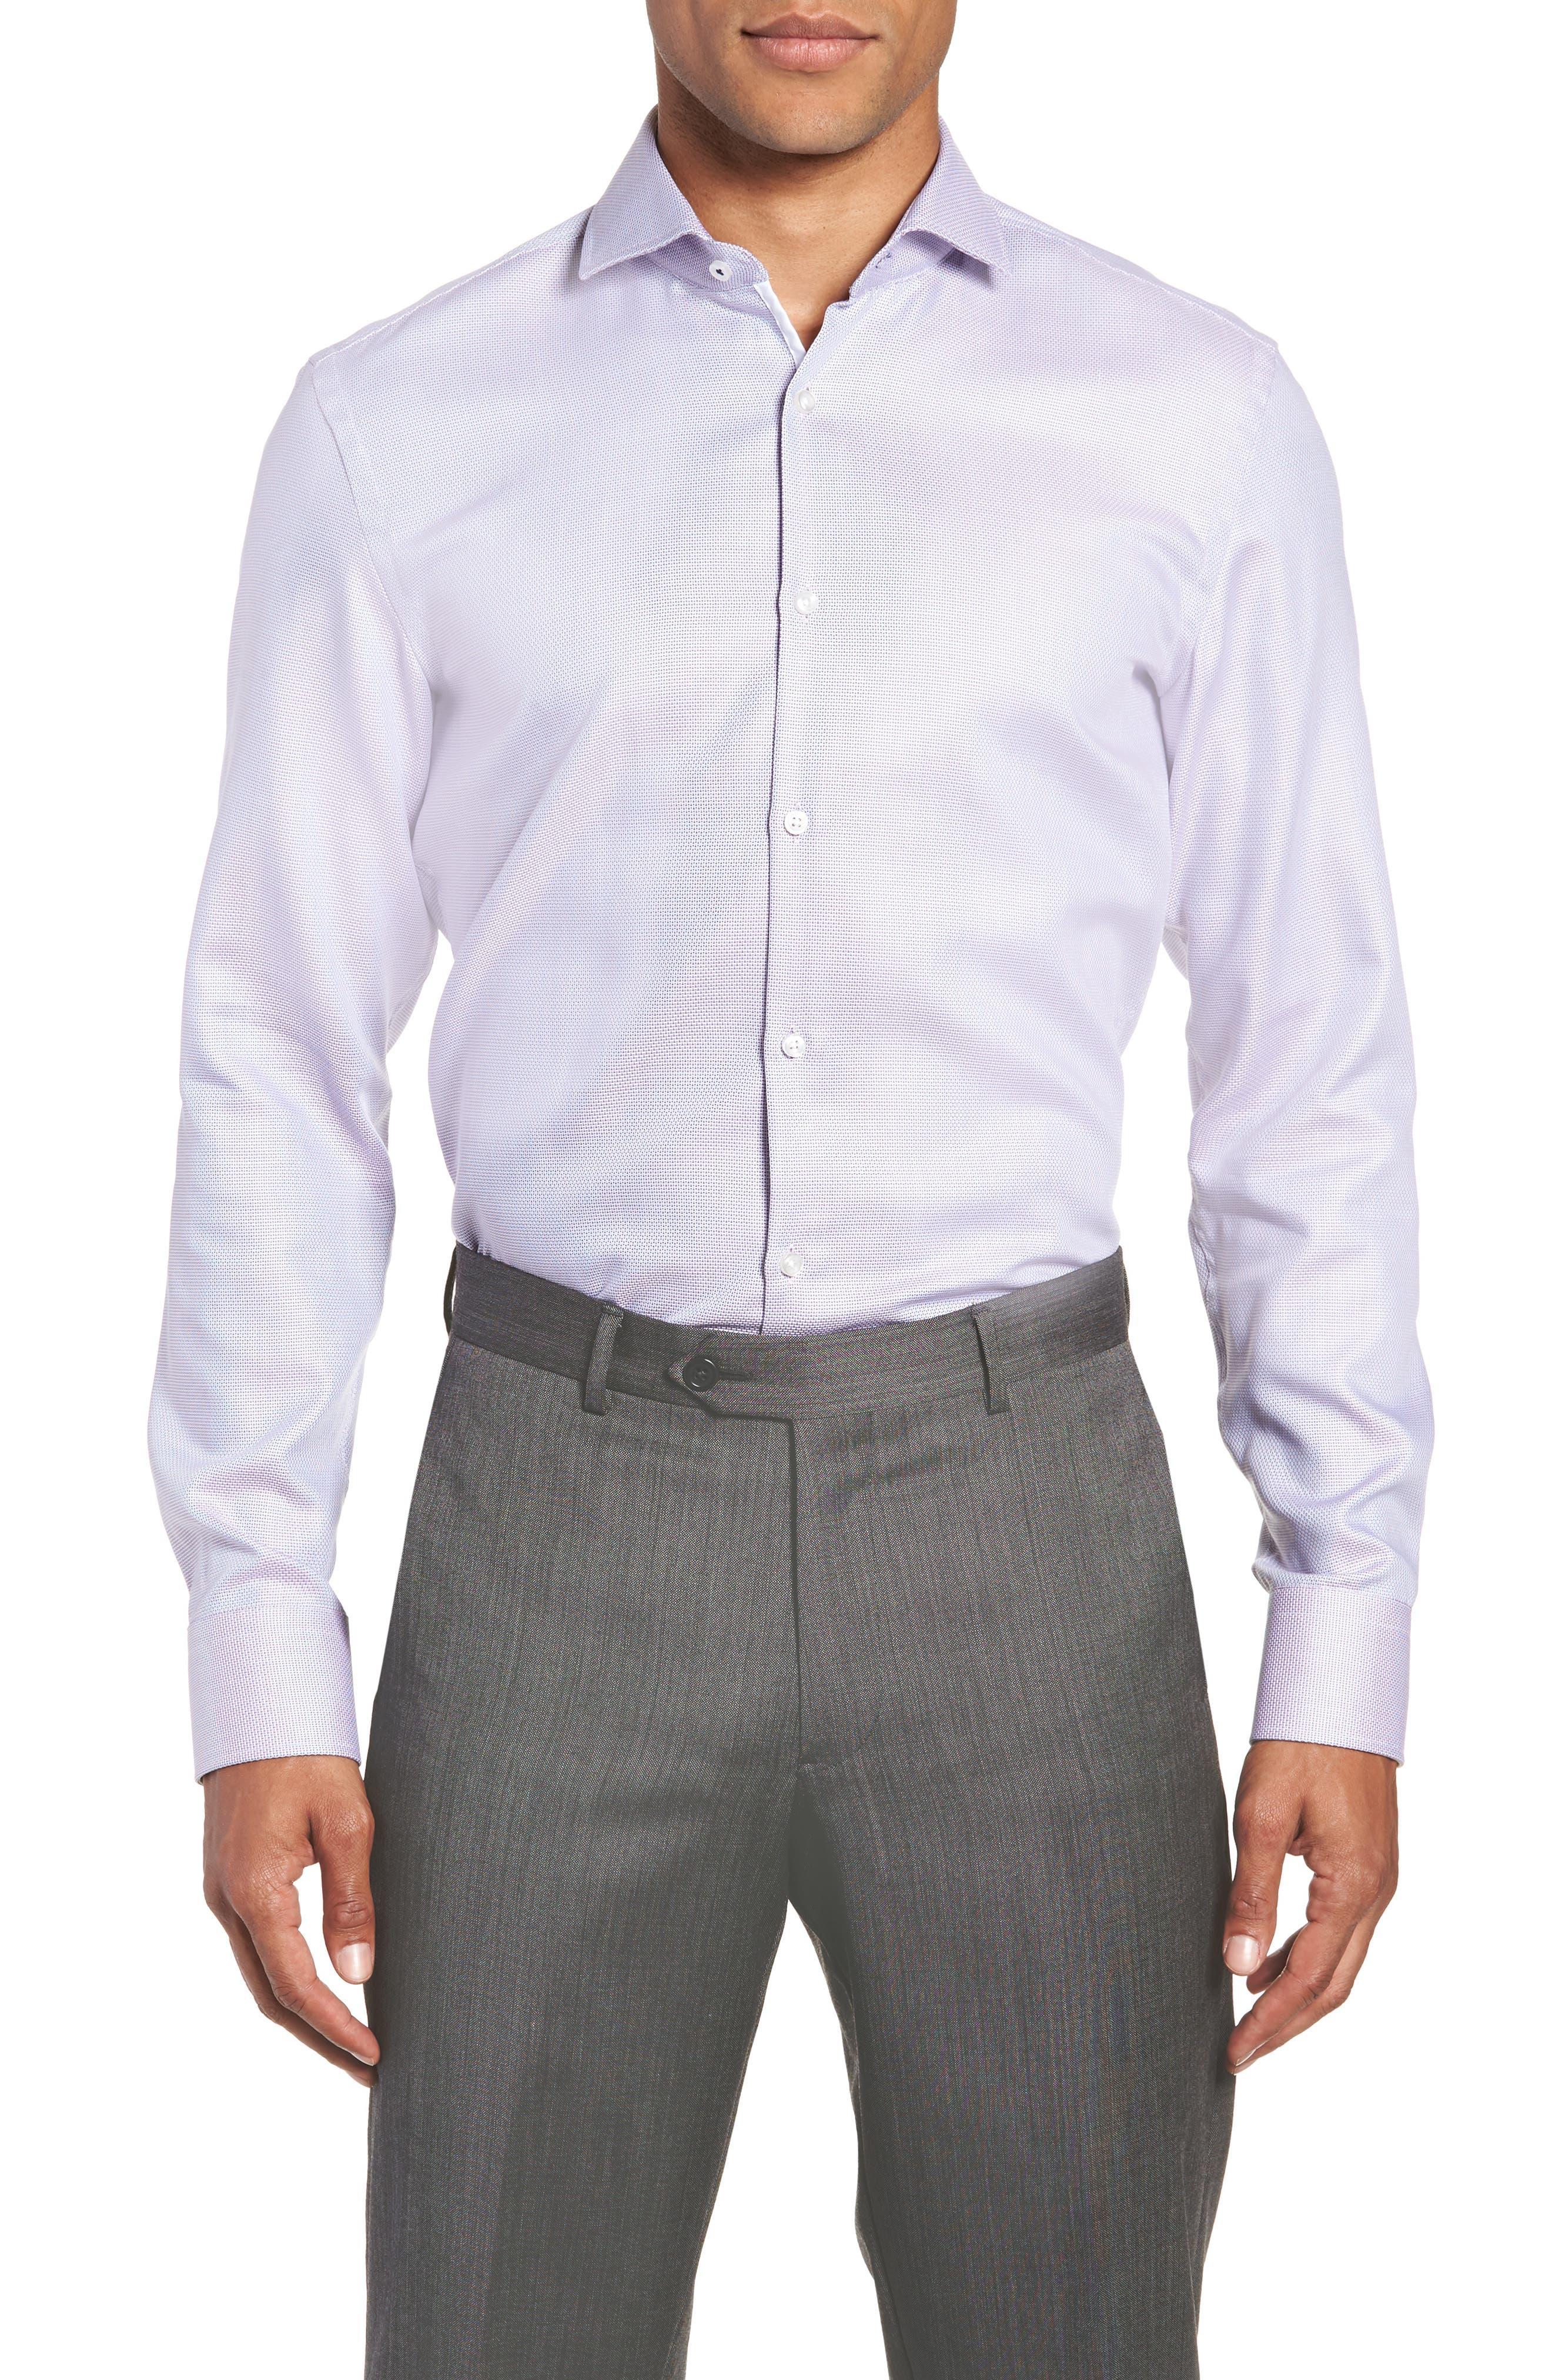 BOSS,                             x Nordstrom Jerrin Slim Fit Solid Dress Shirt,                             Main thumbnail 1, color,                             LAVENDER